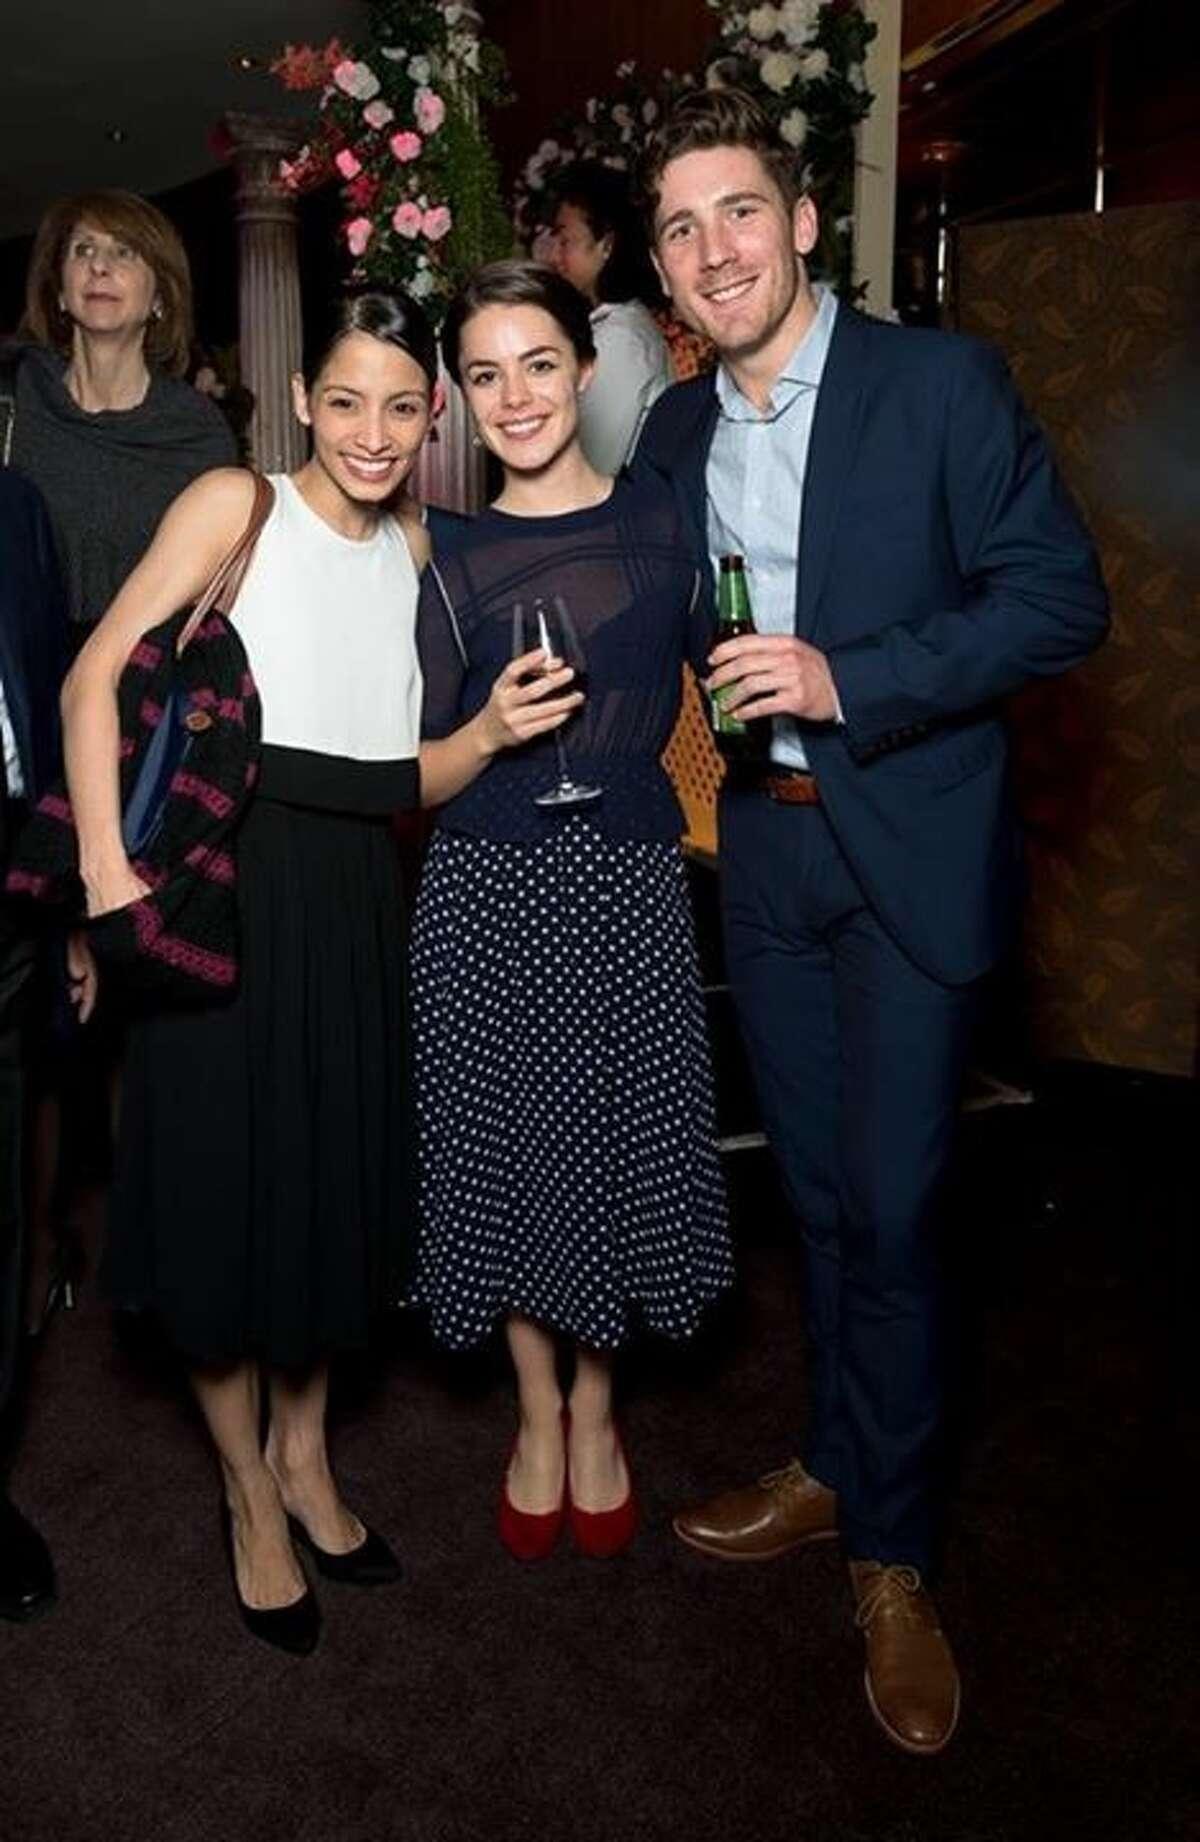 Karina Gonzales, Eloise Fryer and Joseph Chapman